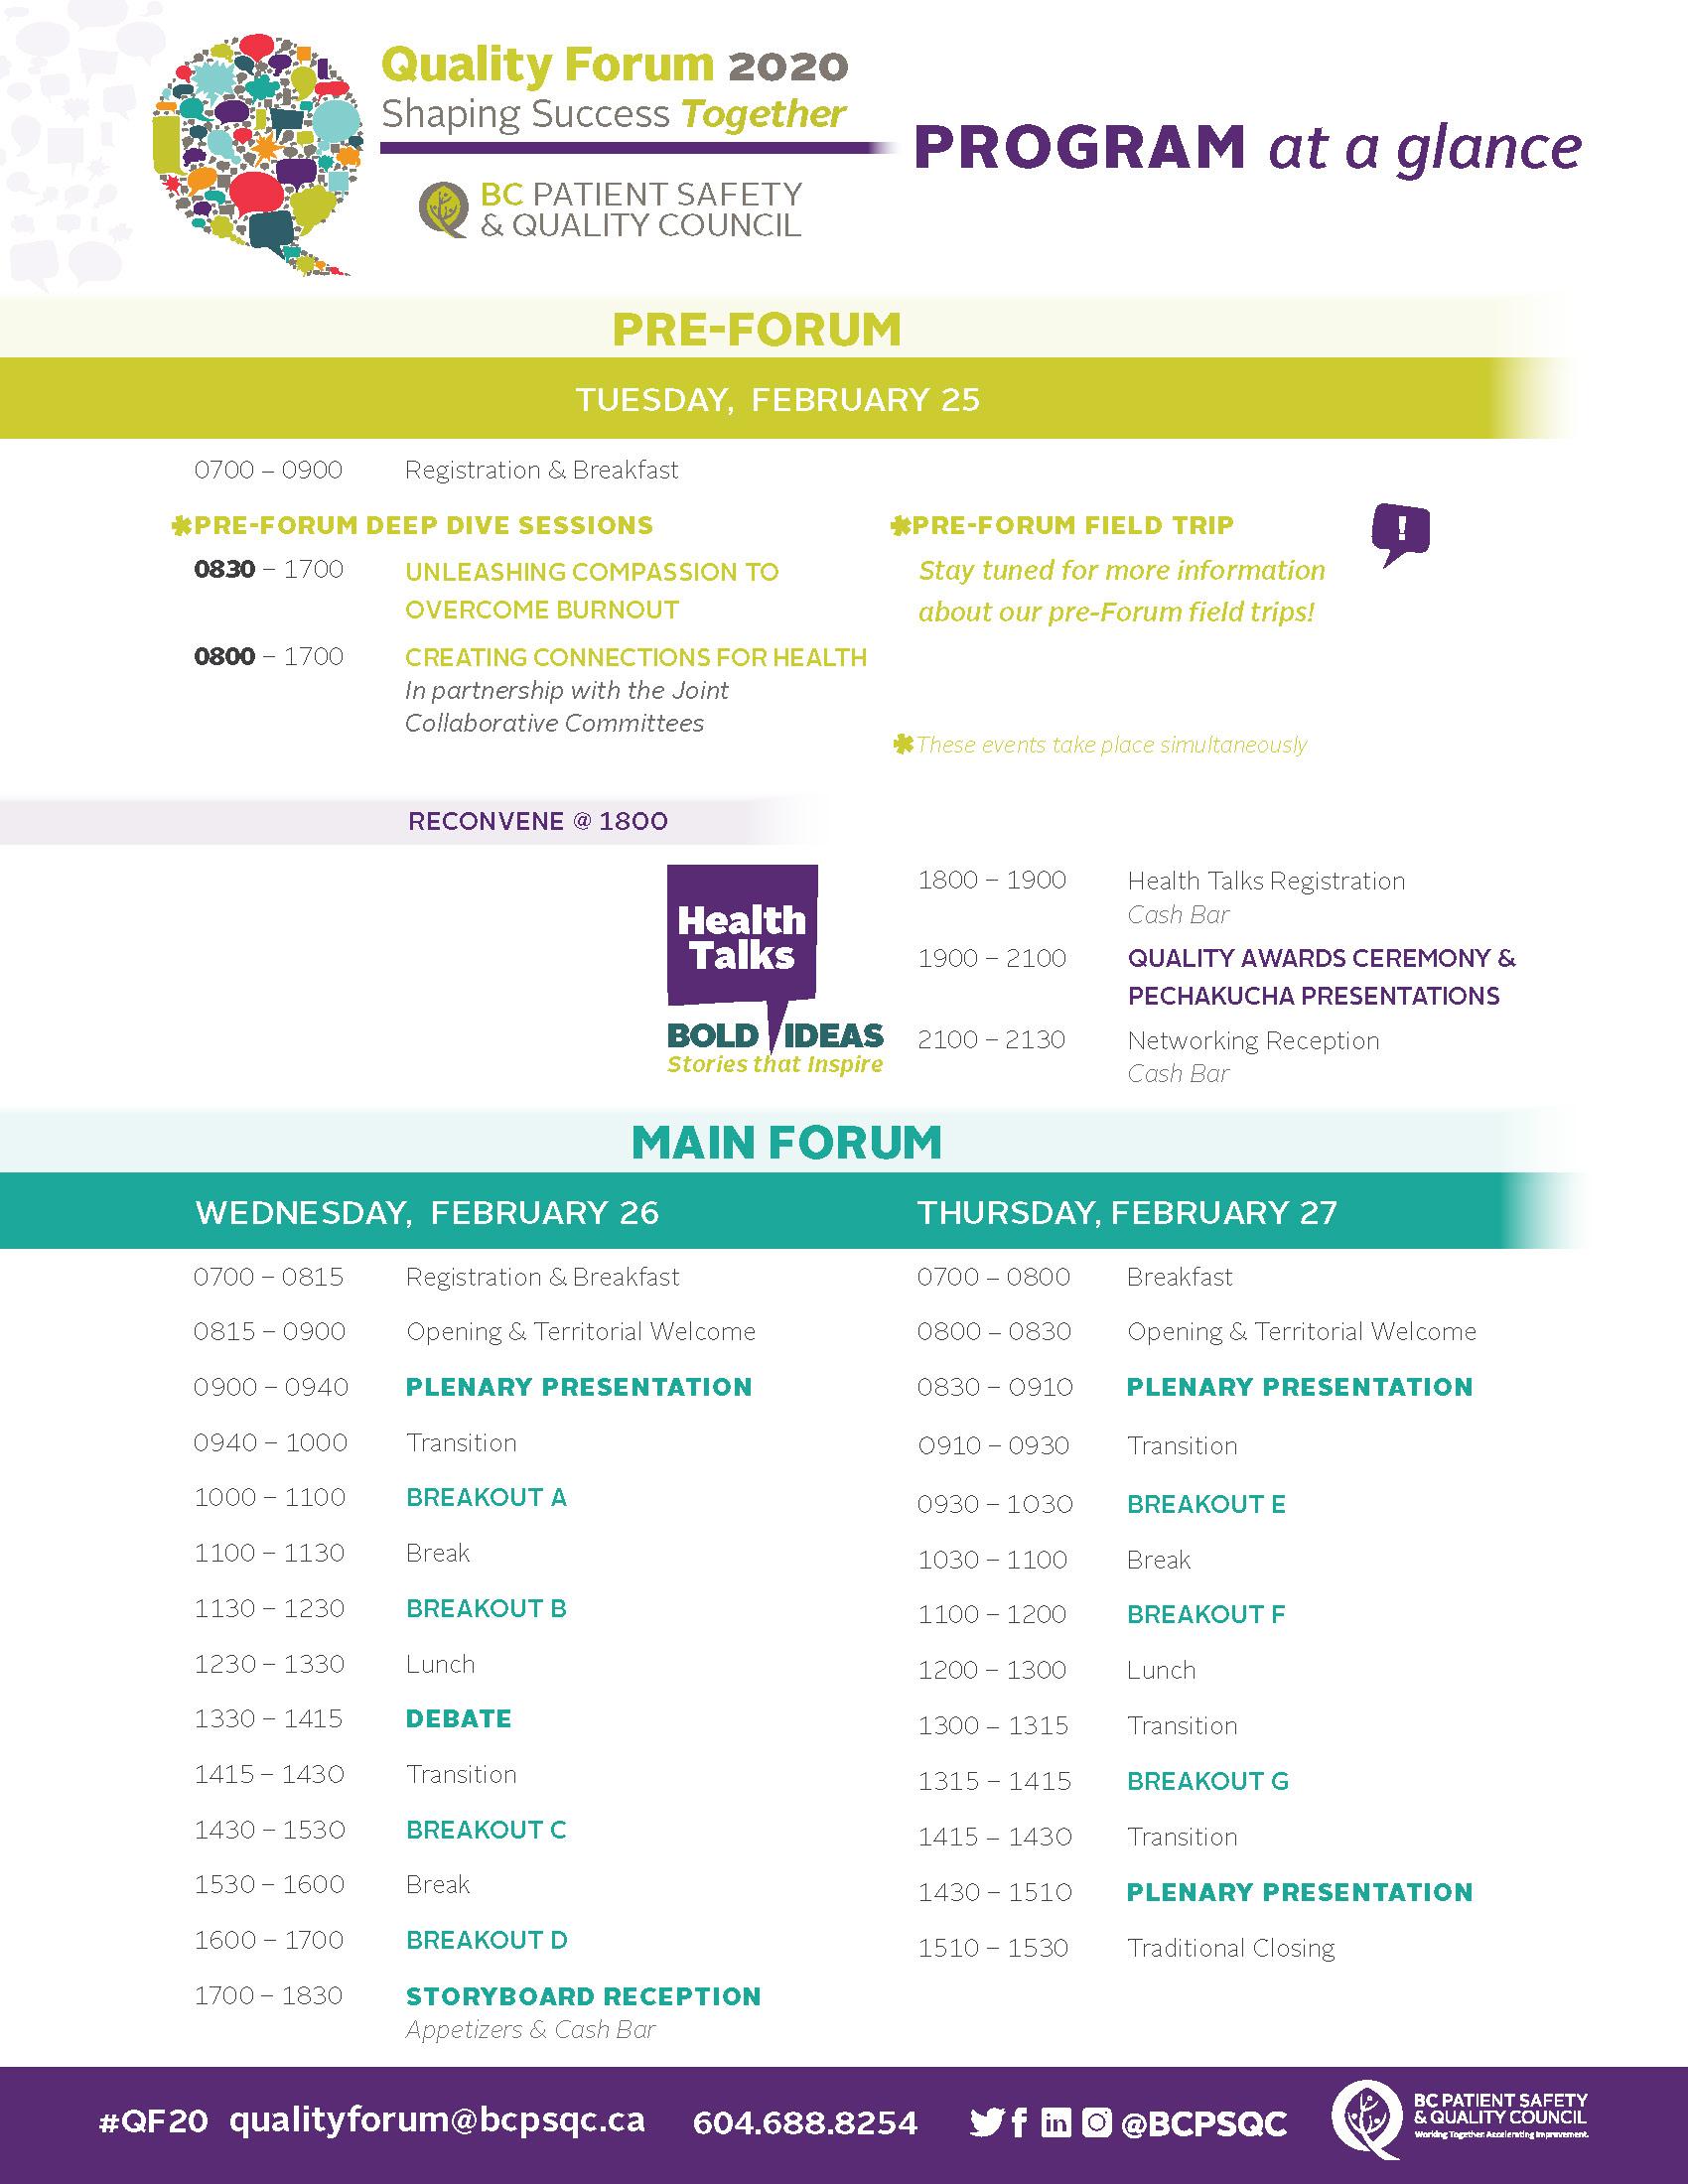 Quality Forum 2020 Program at a Glance